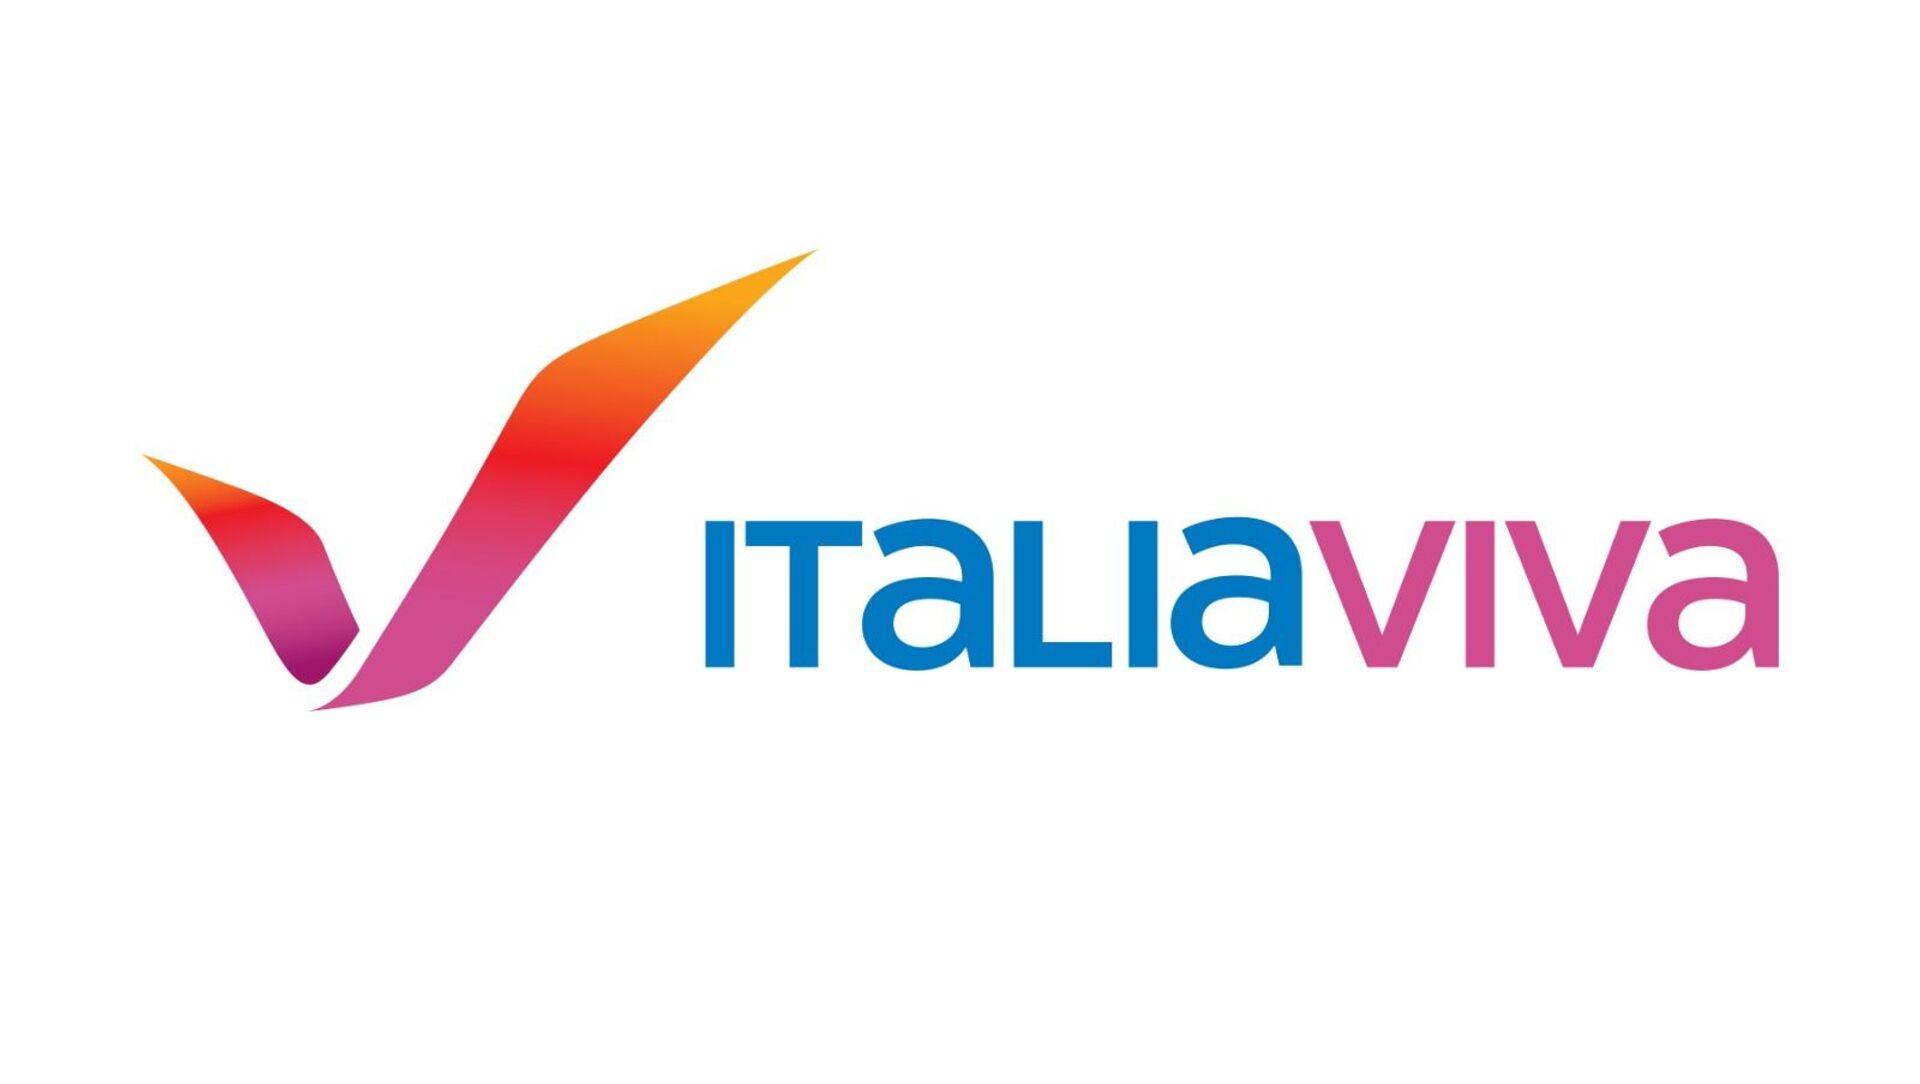 Logo Italia Viva - Sputnik Italia, 1920, 13.04.2021